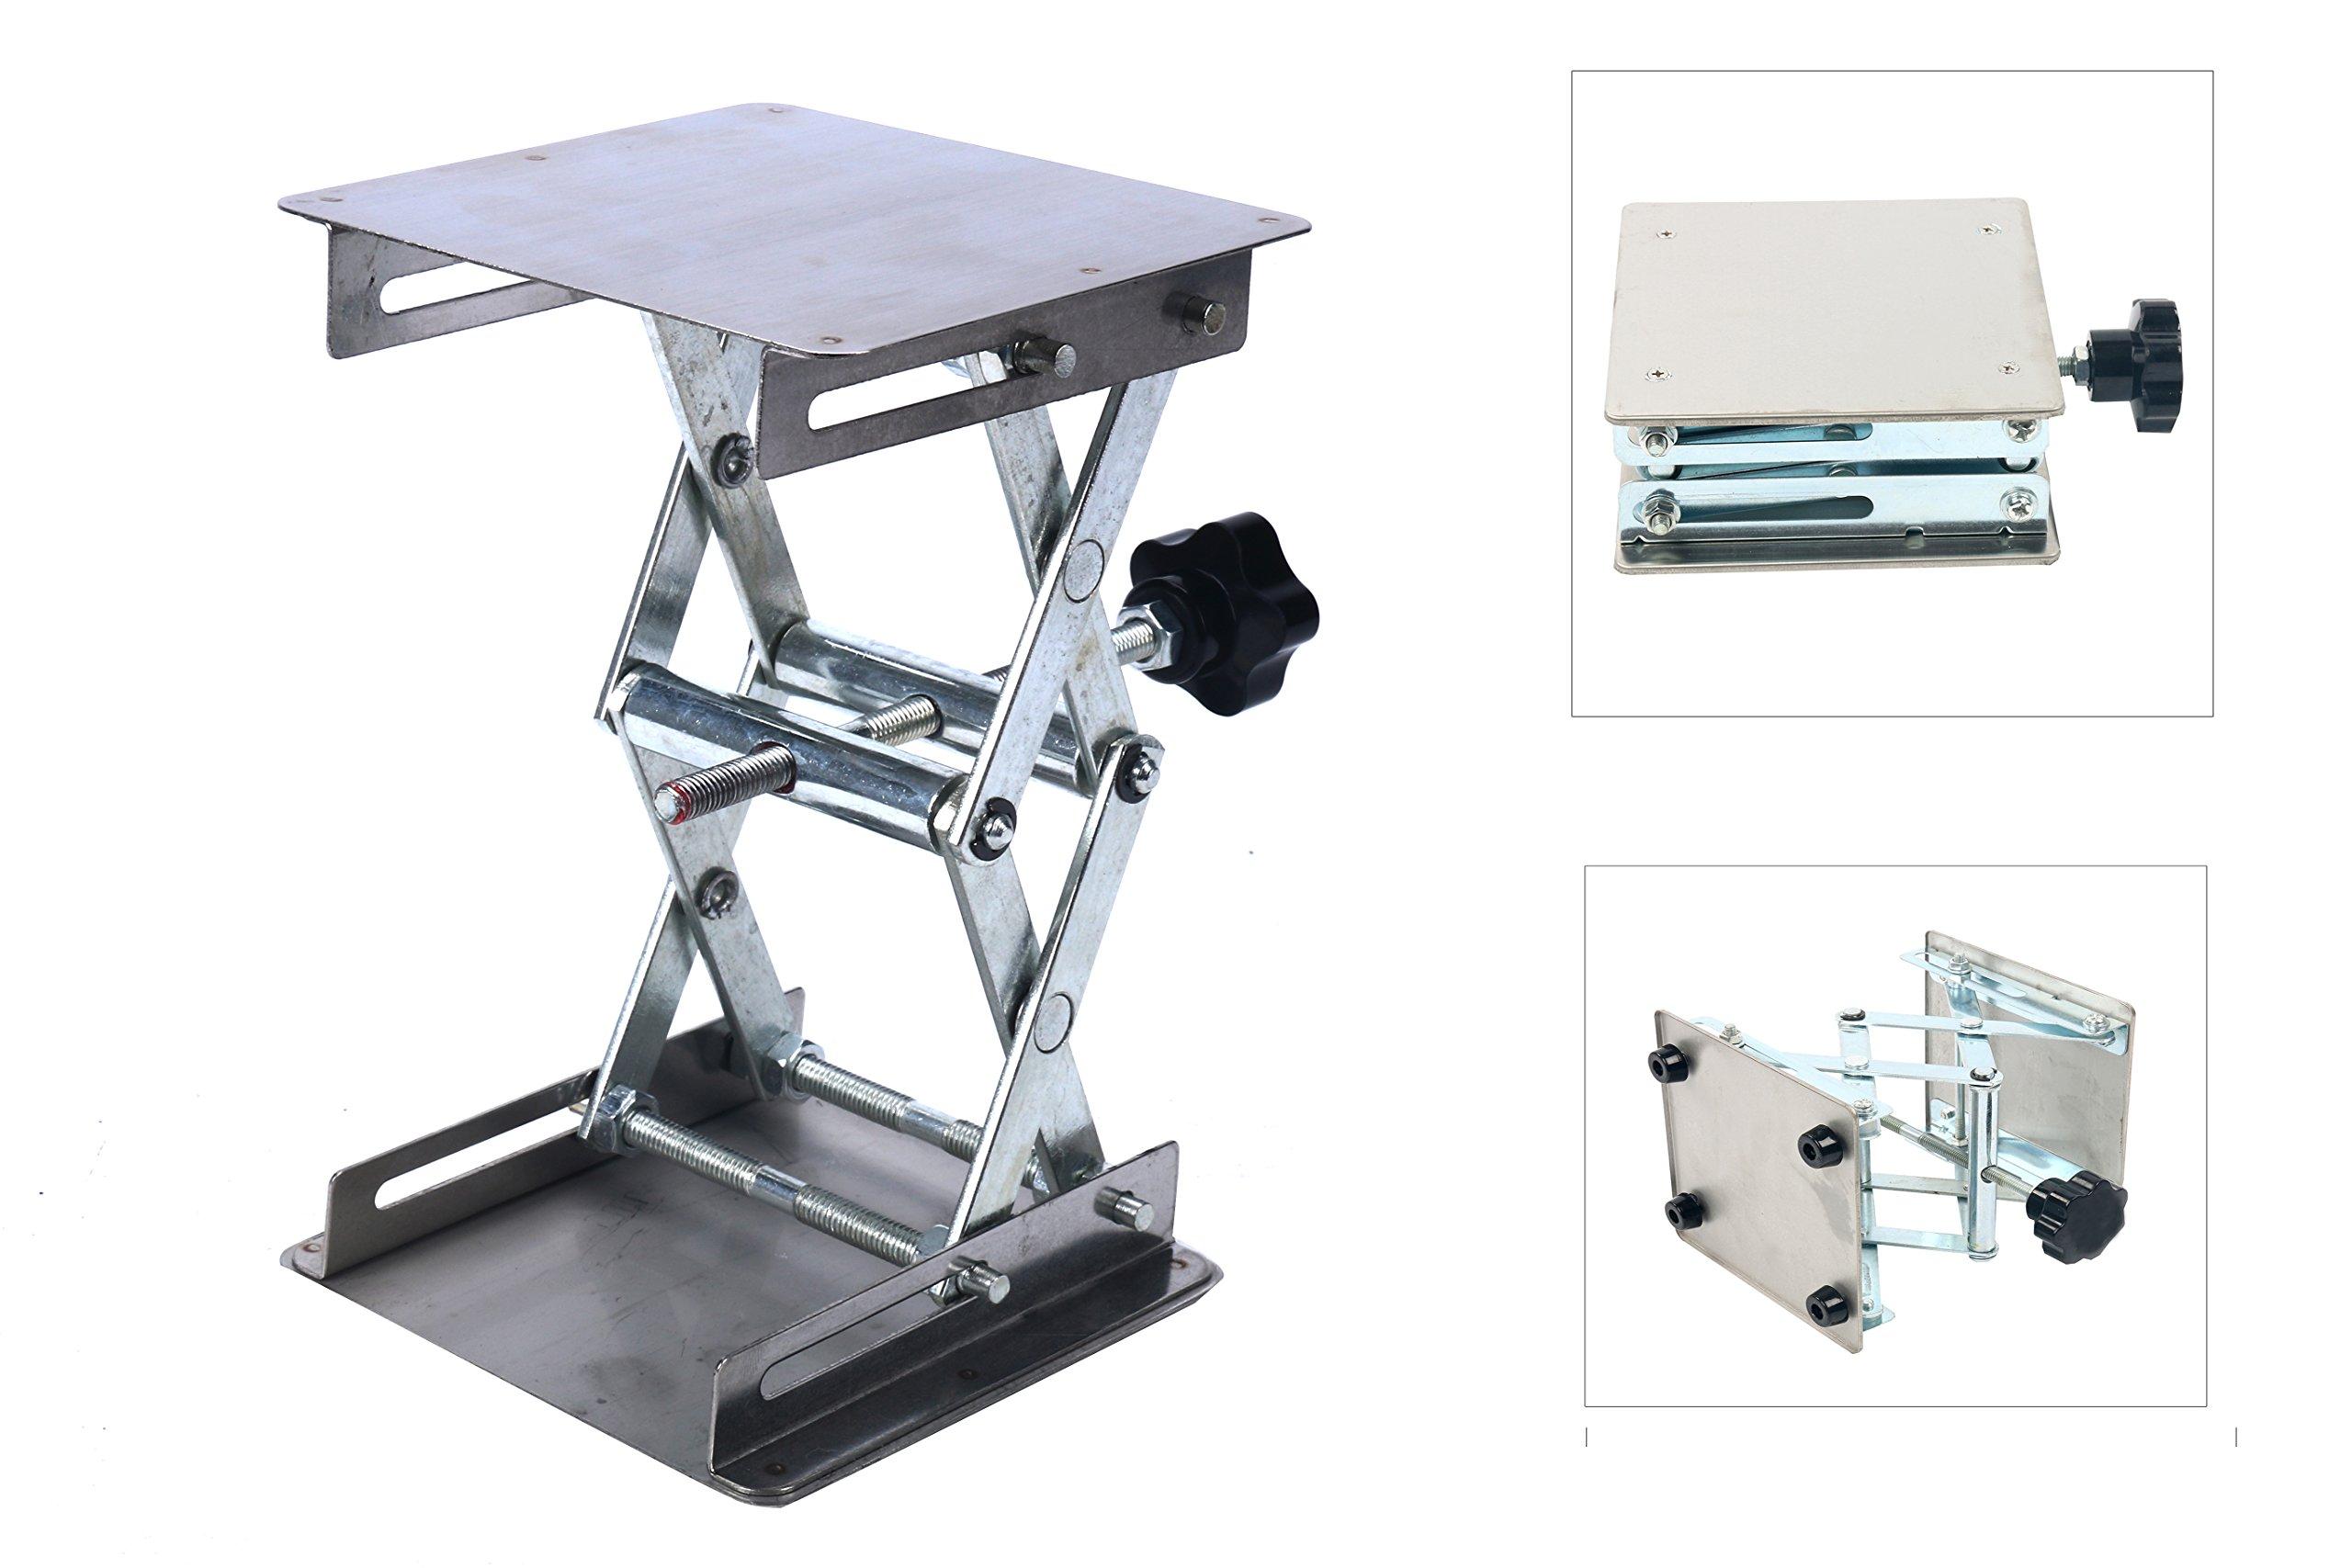 YaeTek 4'' x 4'' 100mm Stainless Steel Lab Jack Scissor Stand Platform LAB Lift laboratory Jiffy Jack Rack Lifter